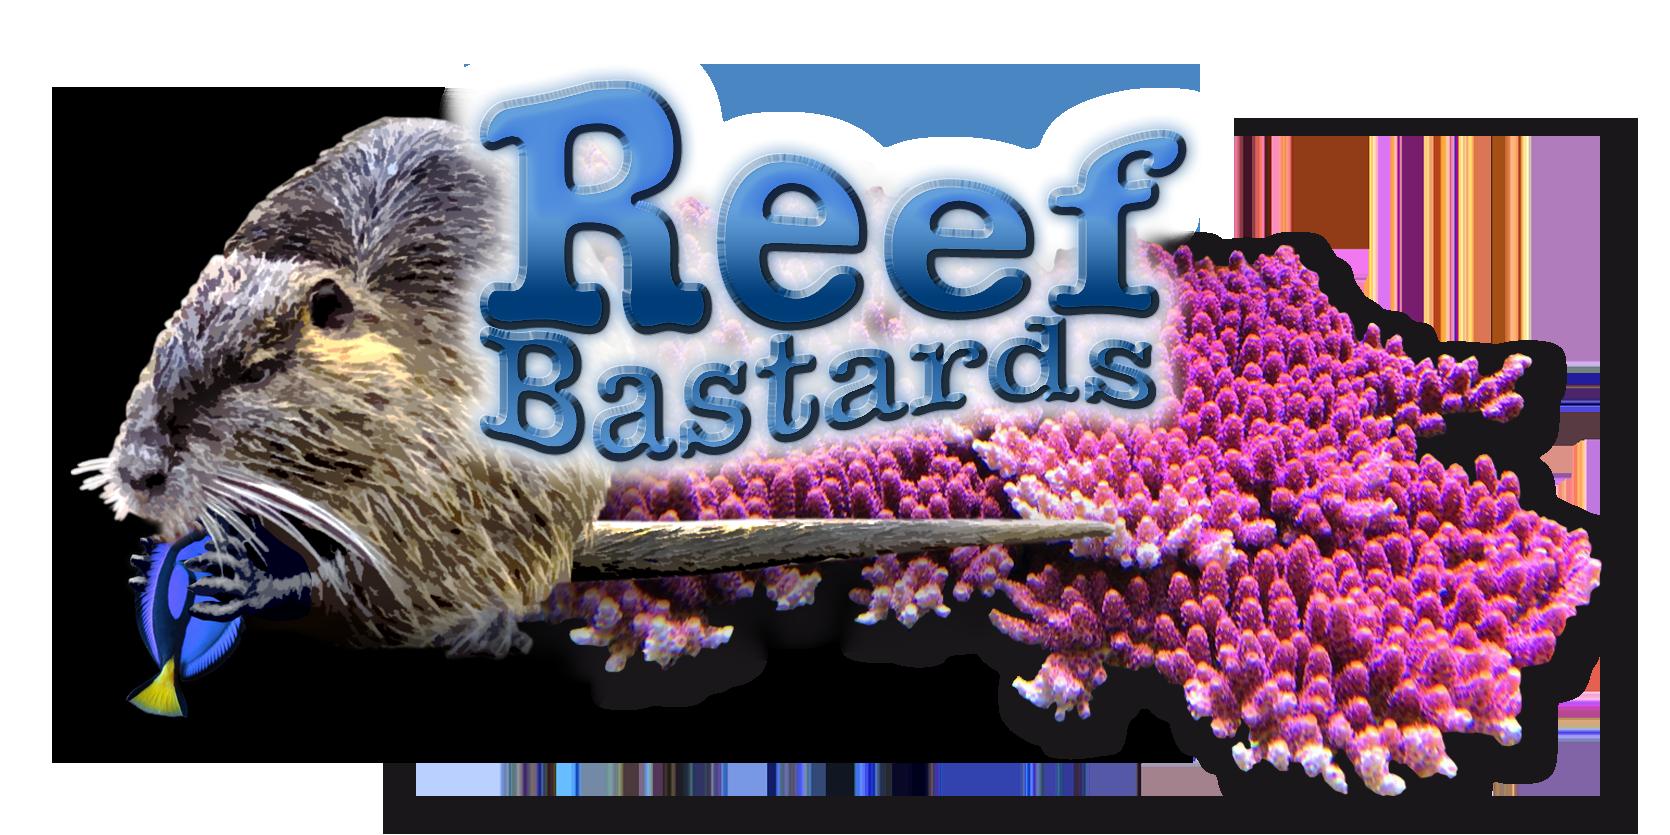 ReefBastards